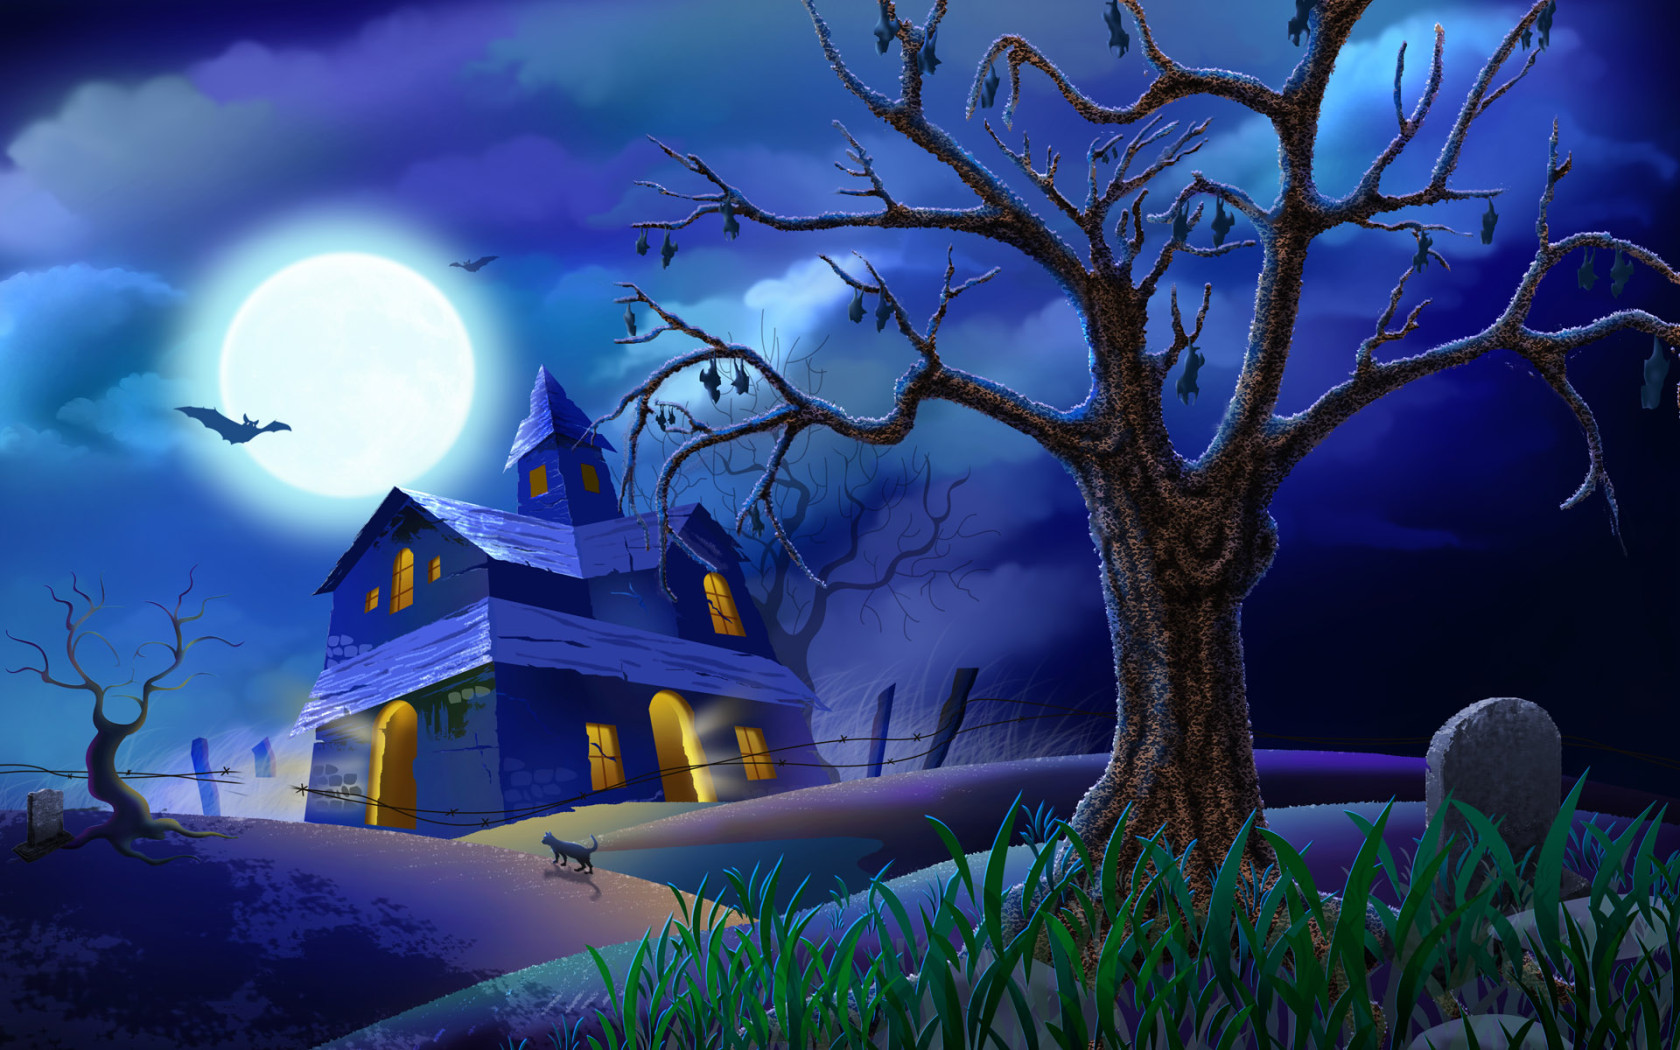 Halloween Desktop Wallpapers FREE on Latorocom 1680x1050